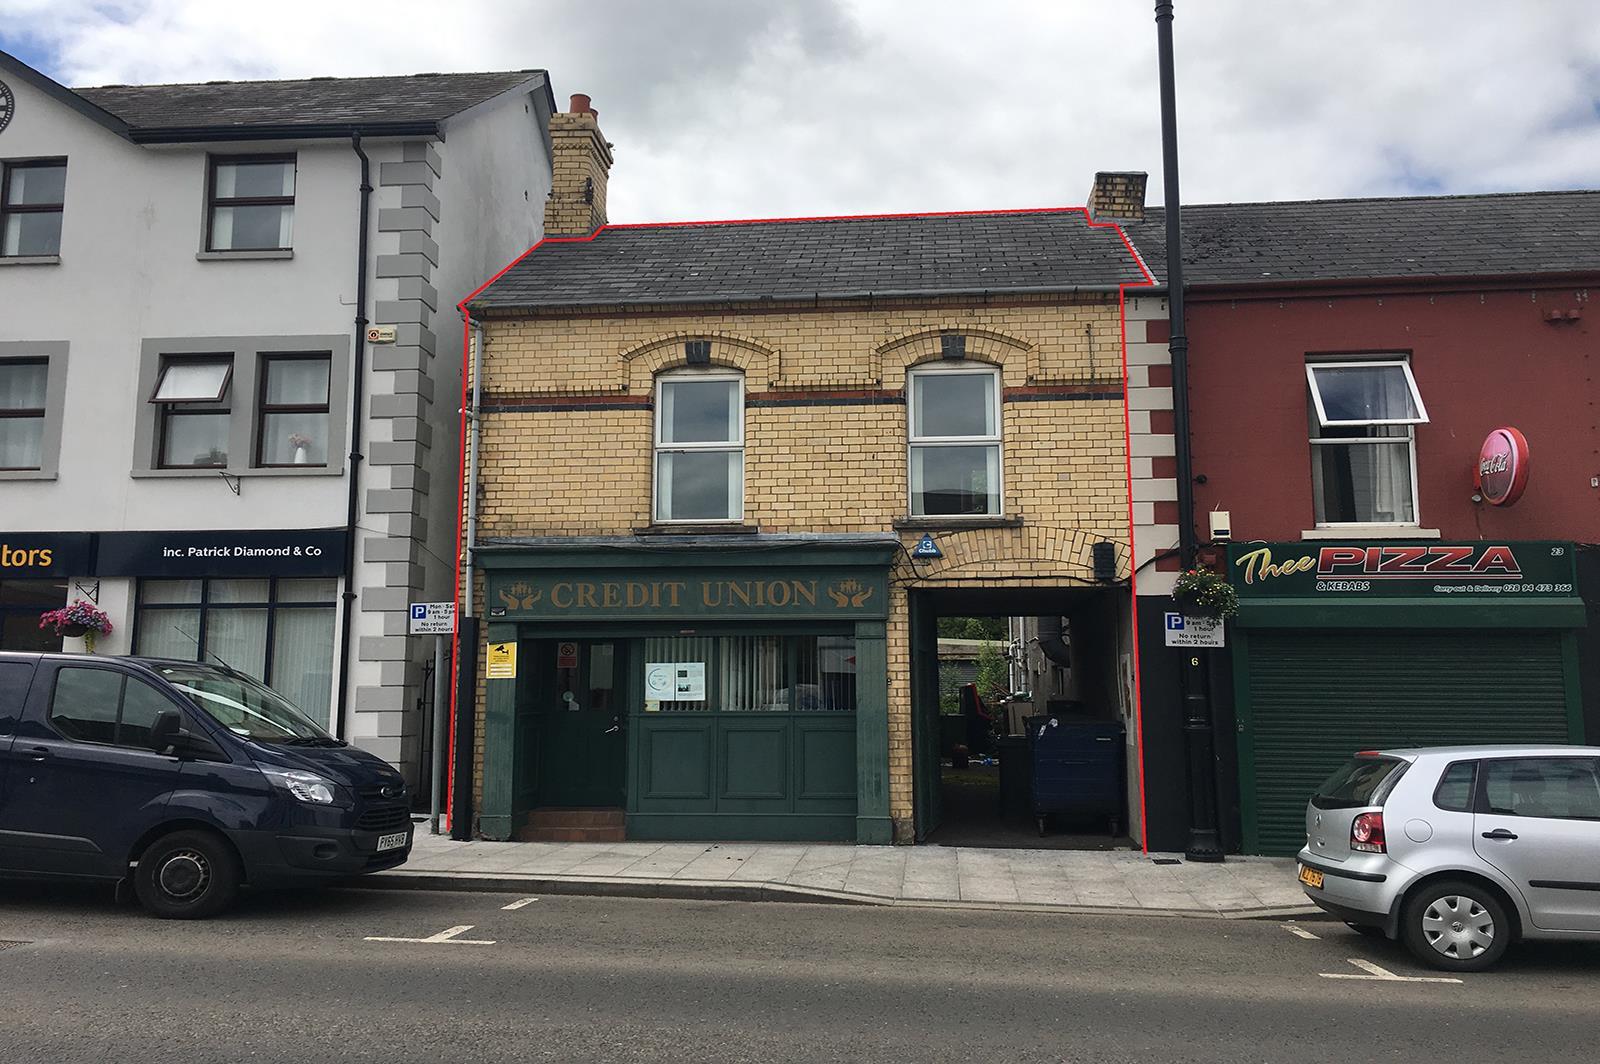 27 New Street, Randalstown , County Antrim, BT41